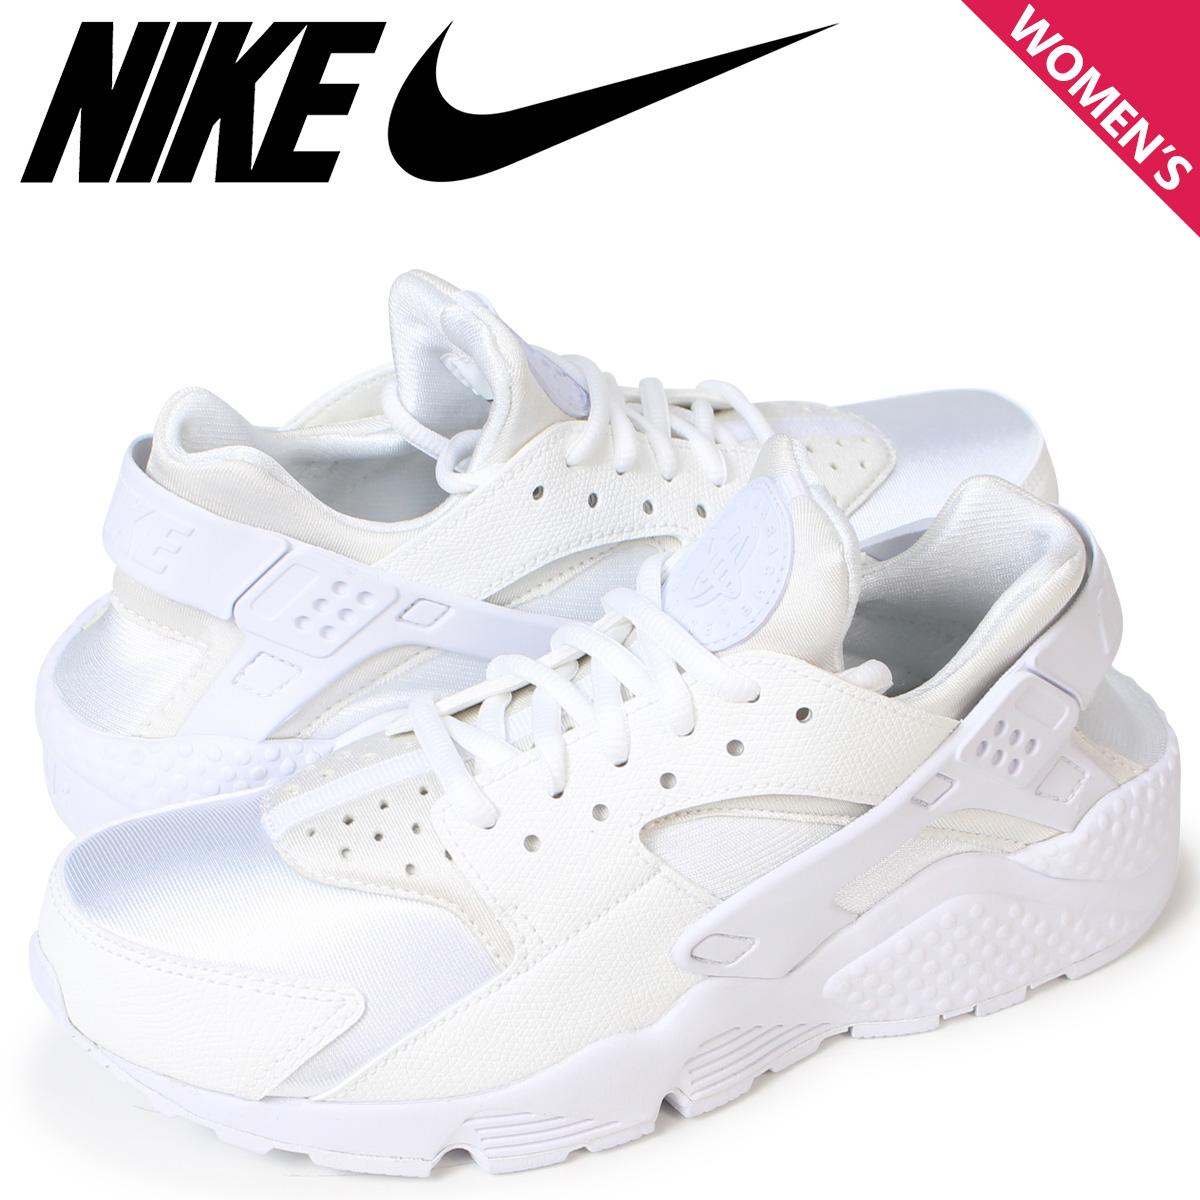 d6d198cbdde53 ALLSPORTS  Nike NIKE エアハラチランレディーススニーカー WMNS AIR HUARACHE RUN 634